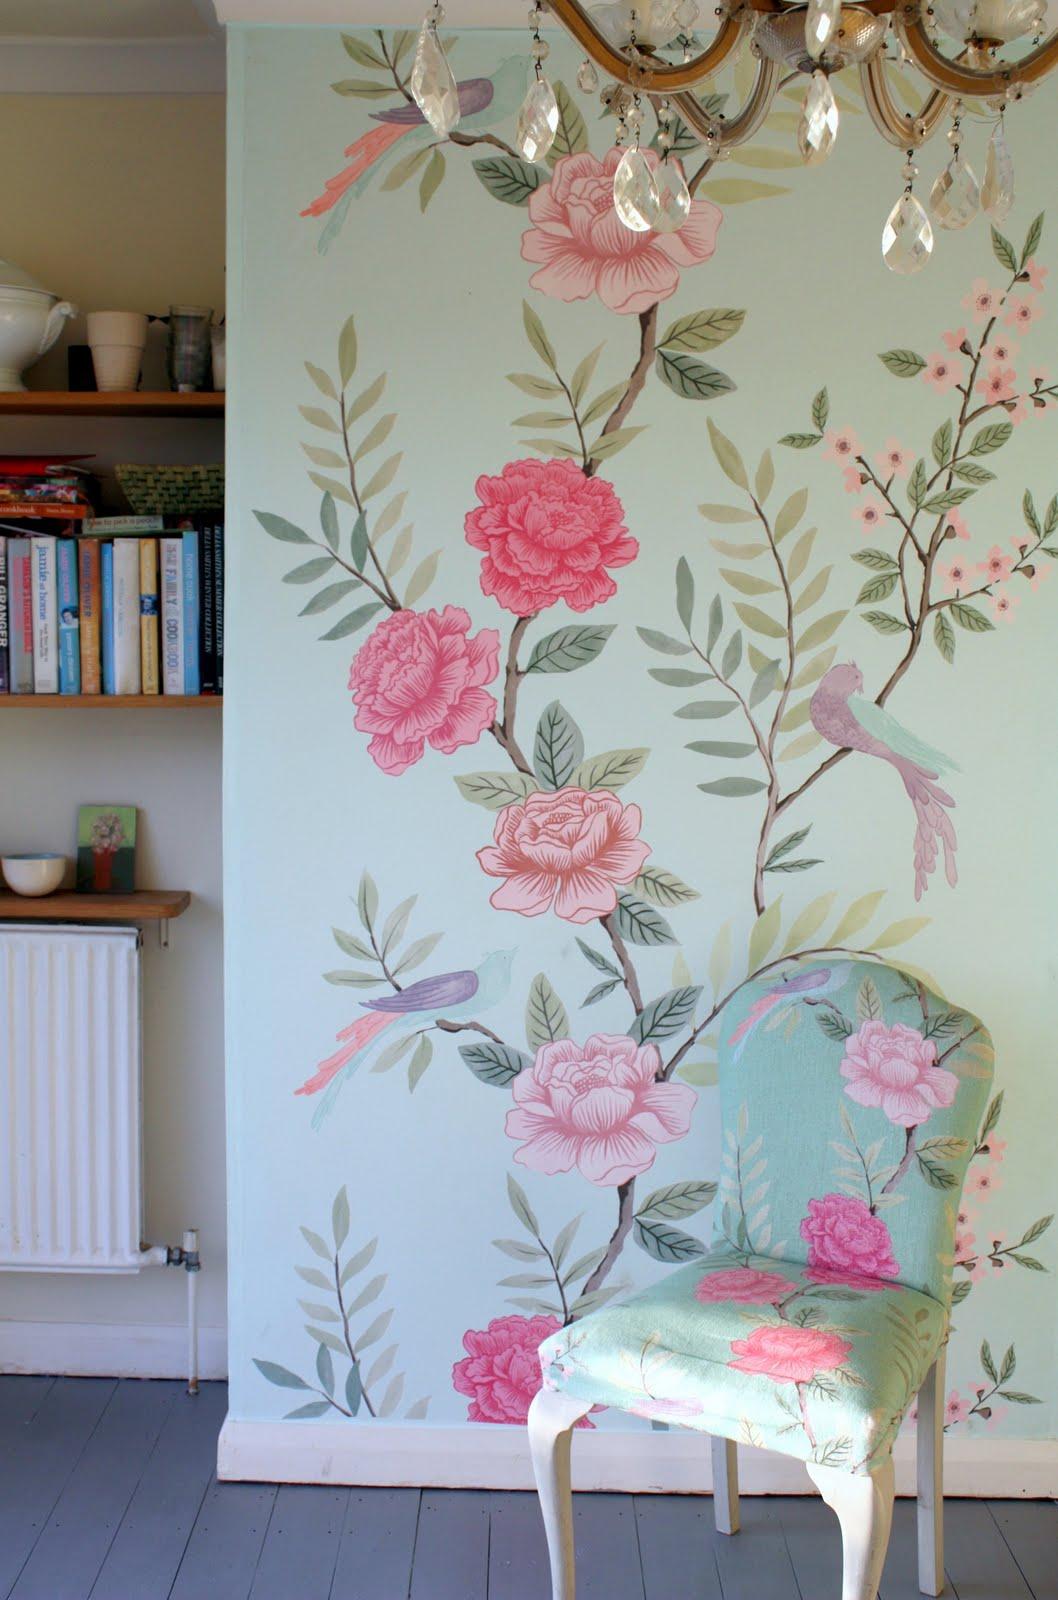 http://1.bp.blogspot.com/-q7py0Kr2rDw/TfTiz0YUdVI/AAAAAAAAEFs/6KlQ9yf1j7o/s1600/luxe+living+chinoiserie+wallpaper+panel+low+res.jpg